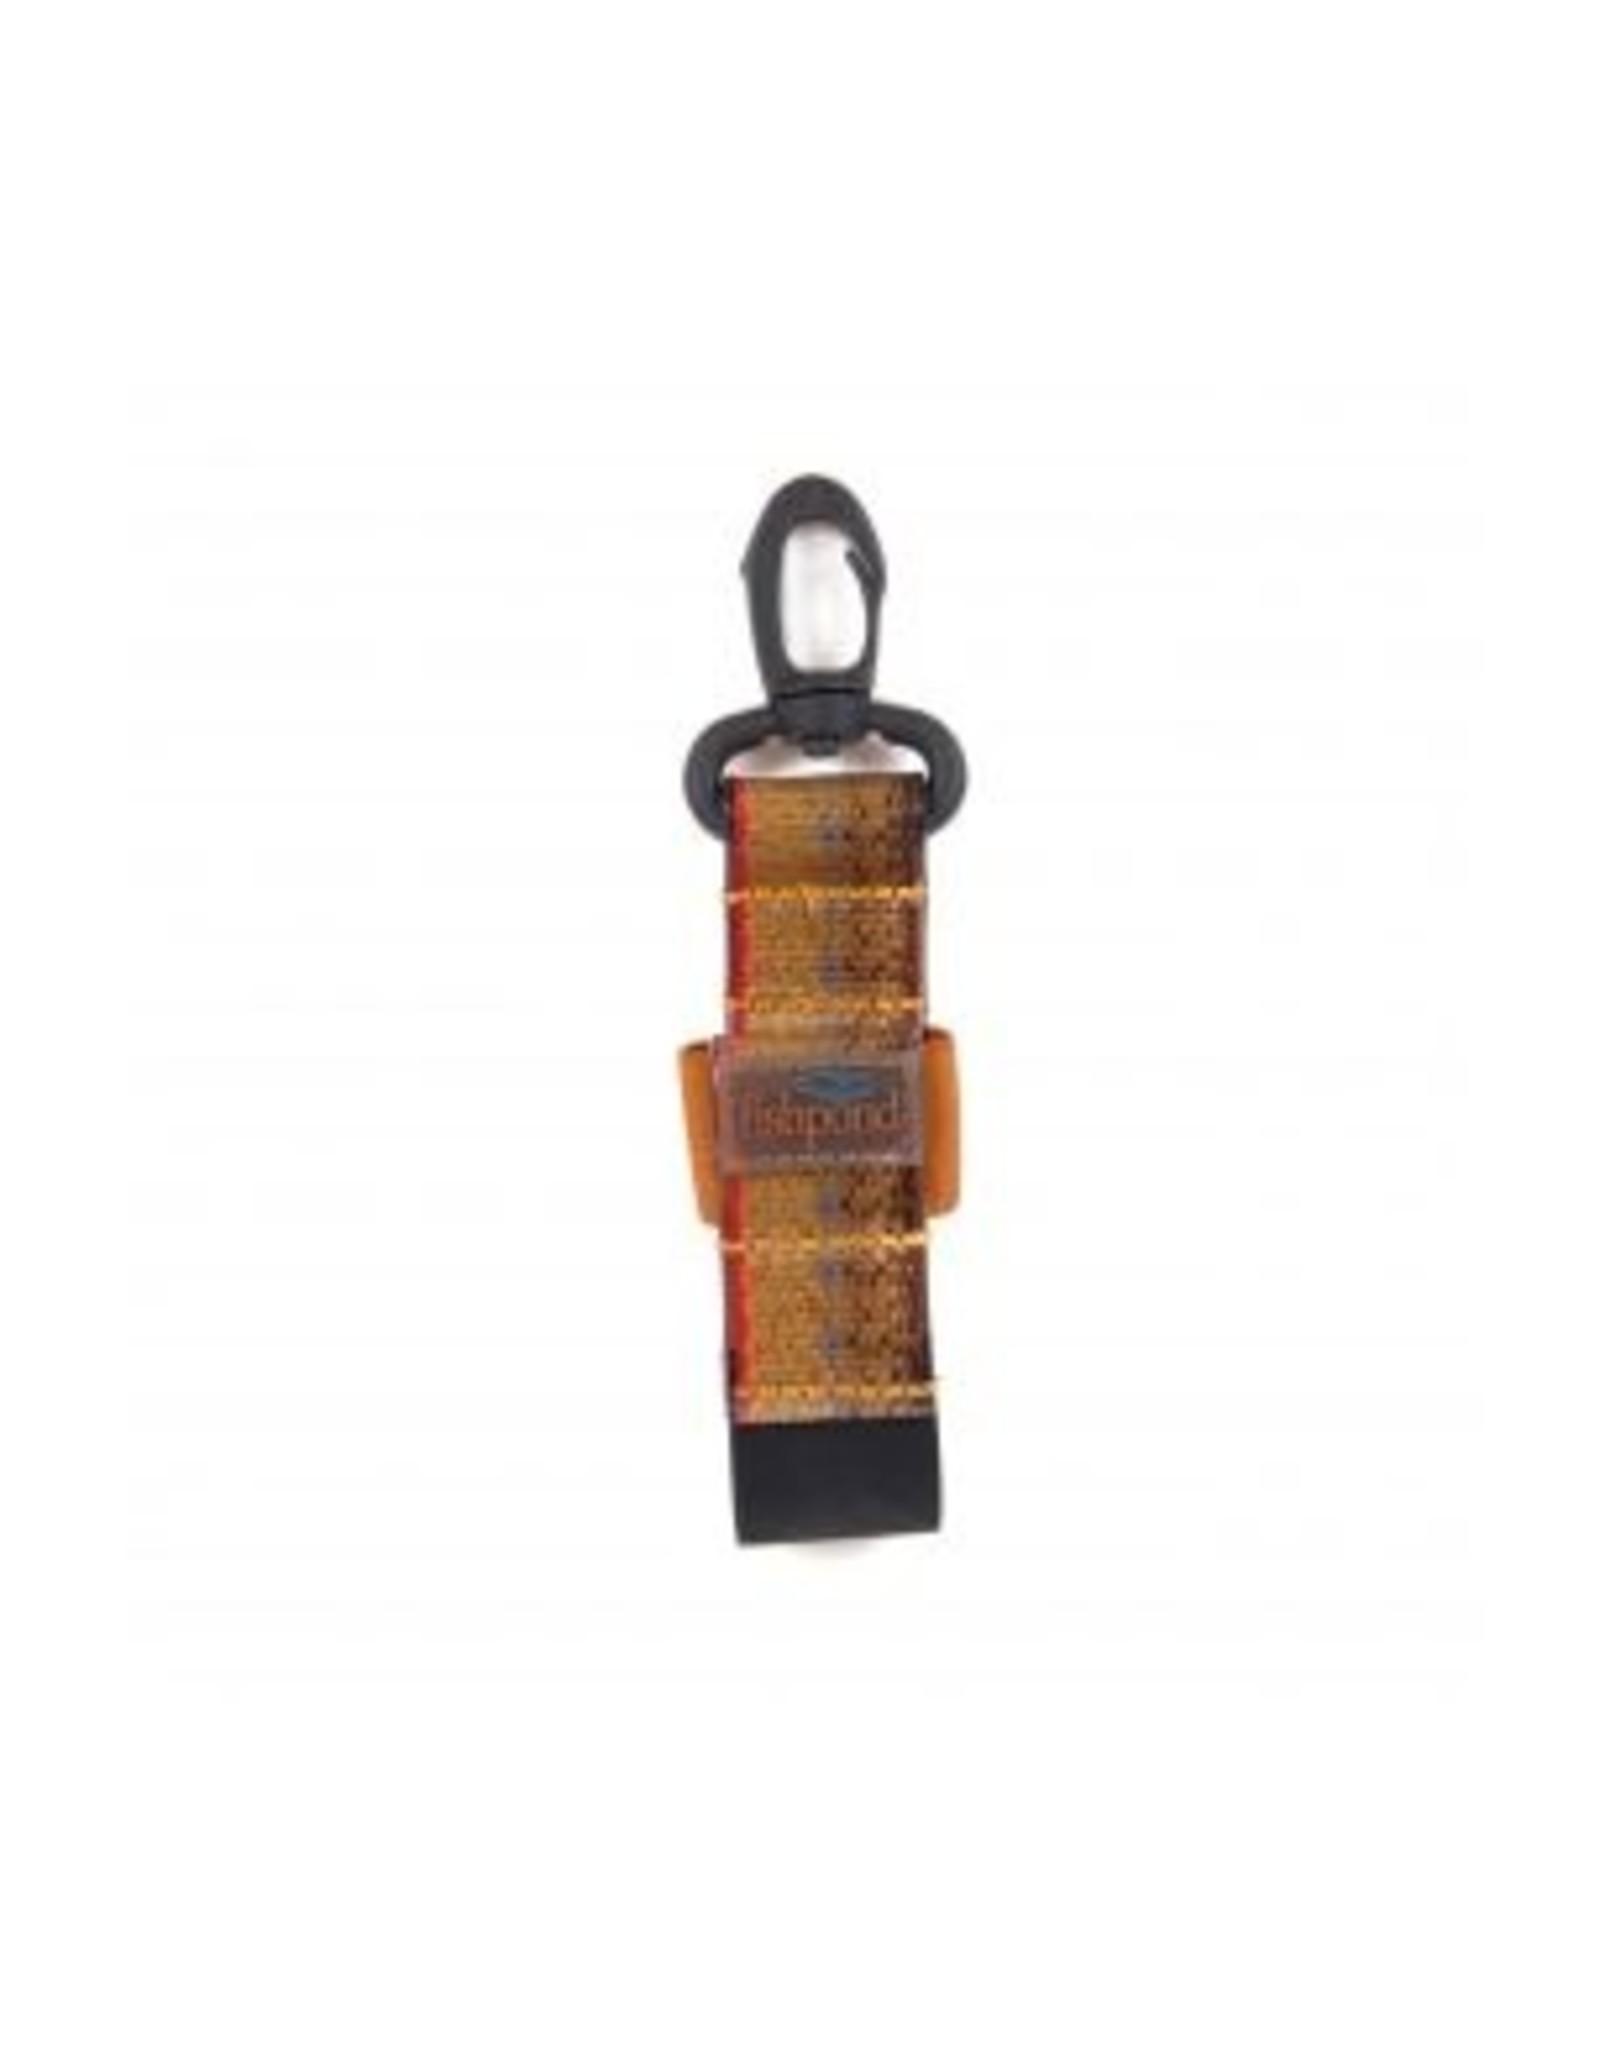 Fishpond Fishpond - Dry Shake Bottle Holder